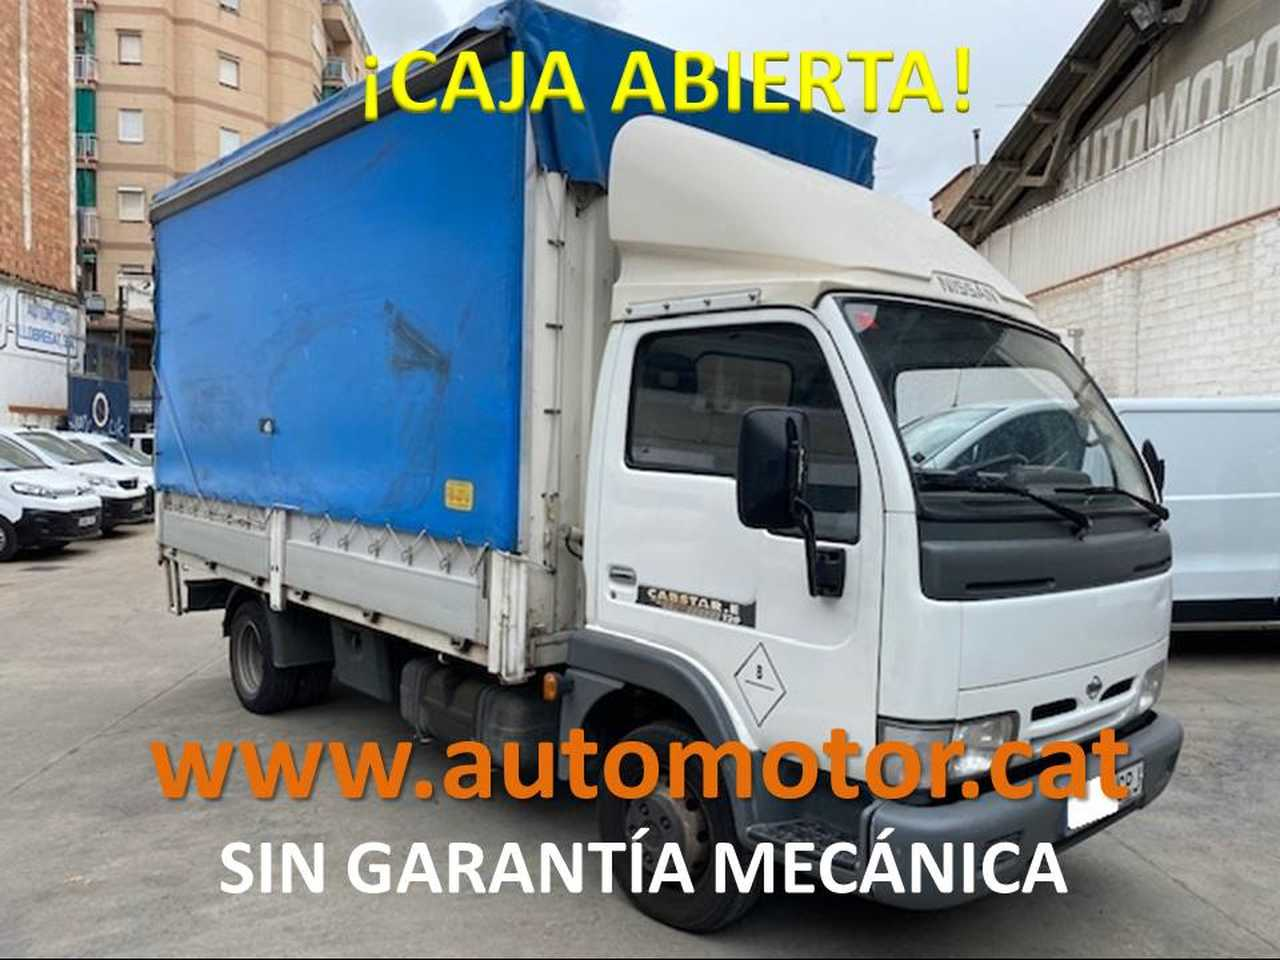 Nissan Cabstar Cabstar-E 120.35/2 Cabina Abatible SIN GARANTIA MECANICA  - Foto 1